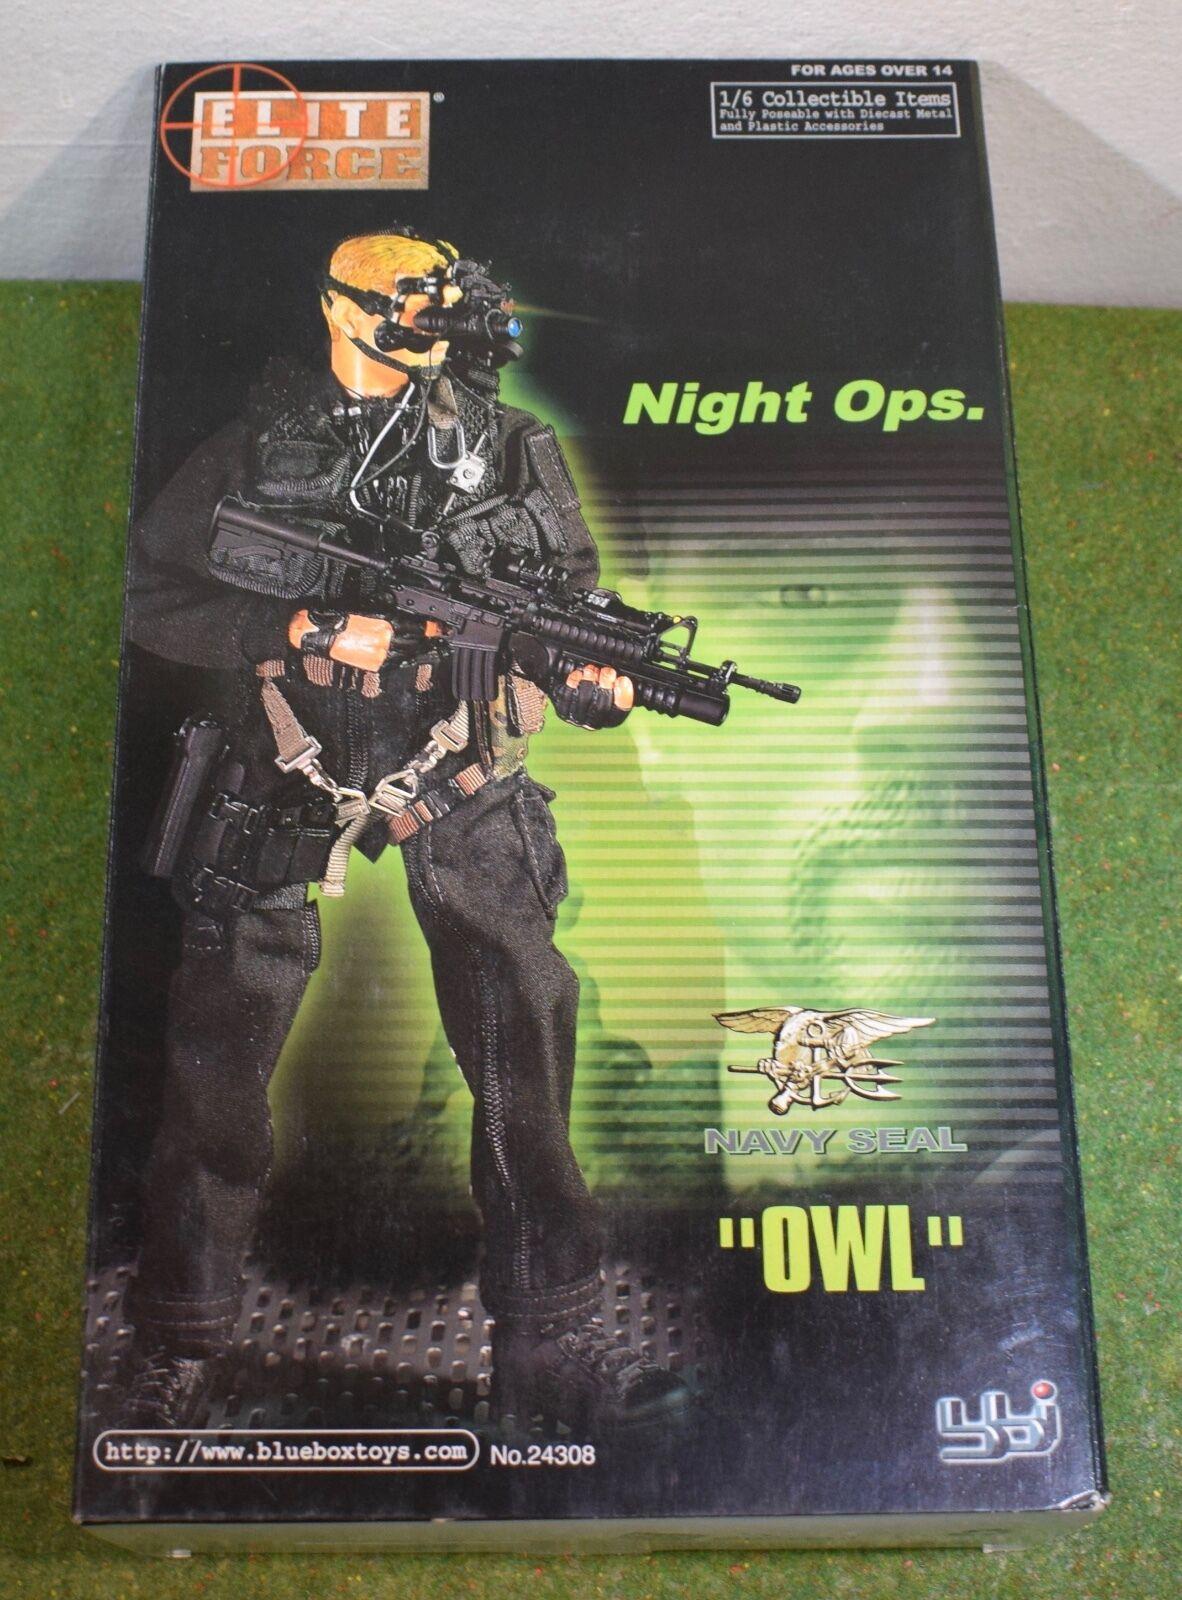 ELITE FORCE - BBI - 1 6 - MODERN - US - OWL - NIGHT OPS NAVY SEAL